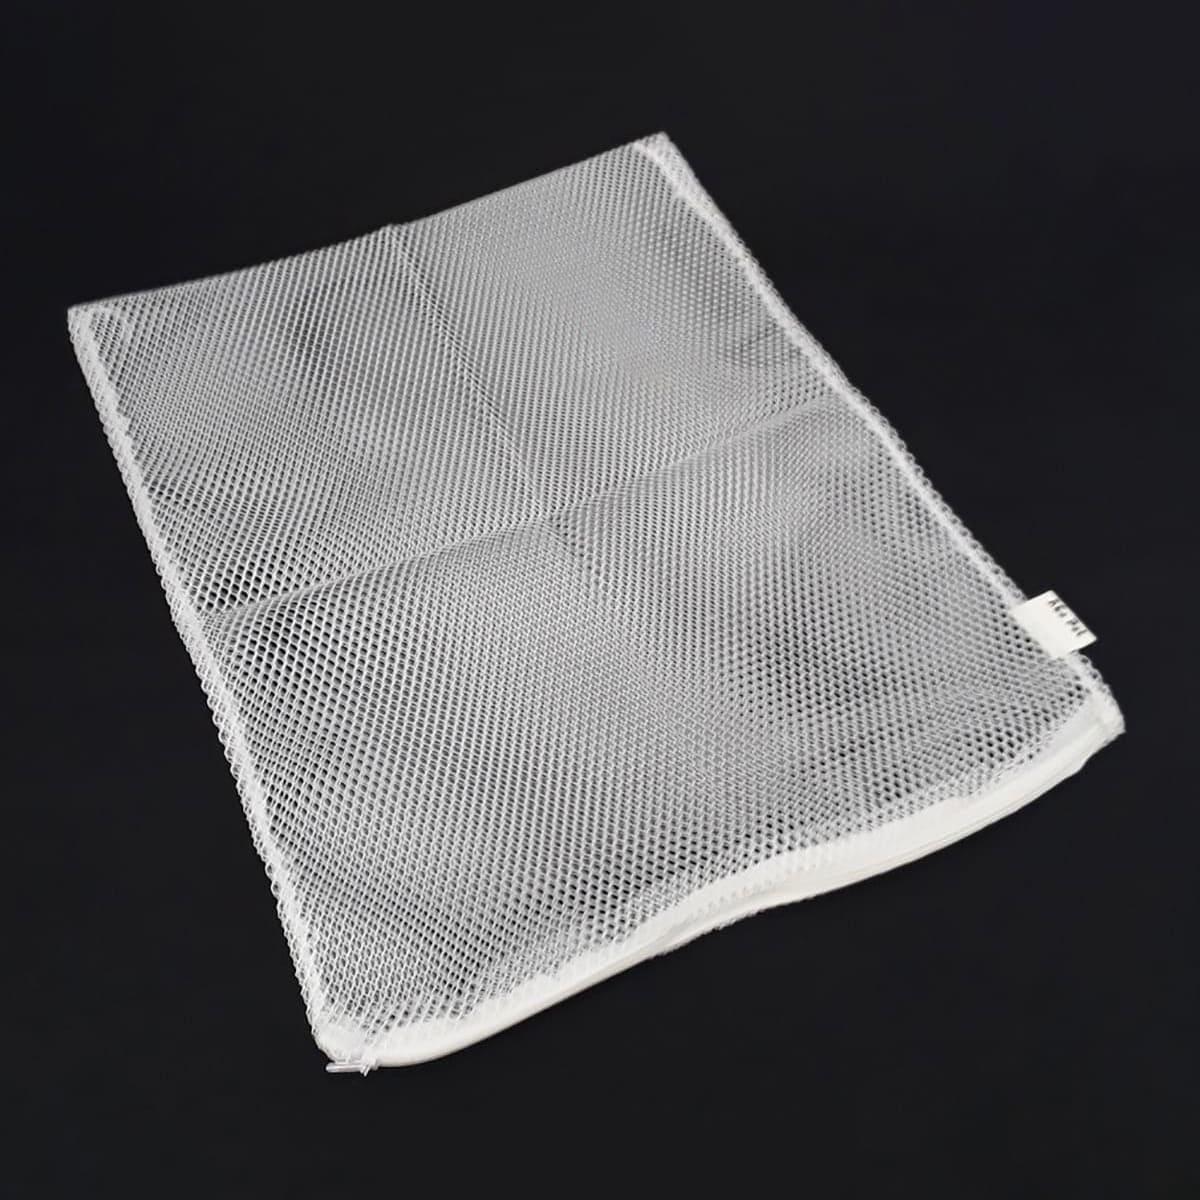 Bolsa para Material Filtrante N°2 WFish - 15X30 cm